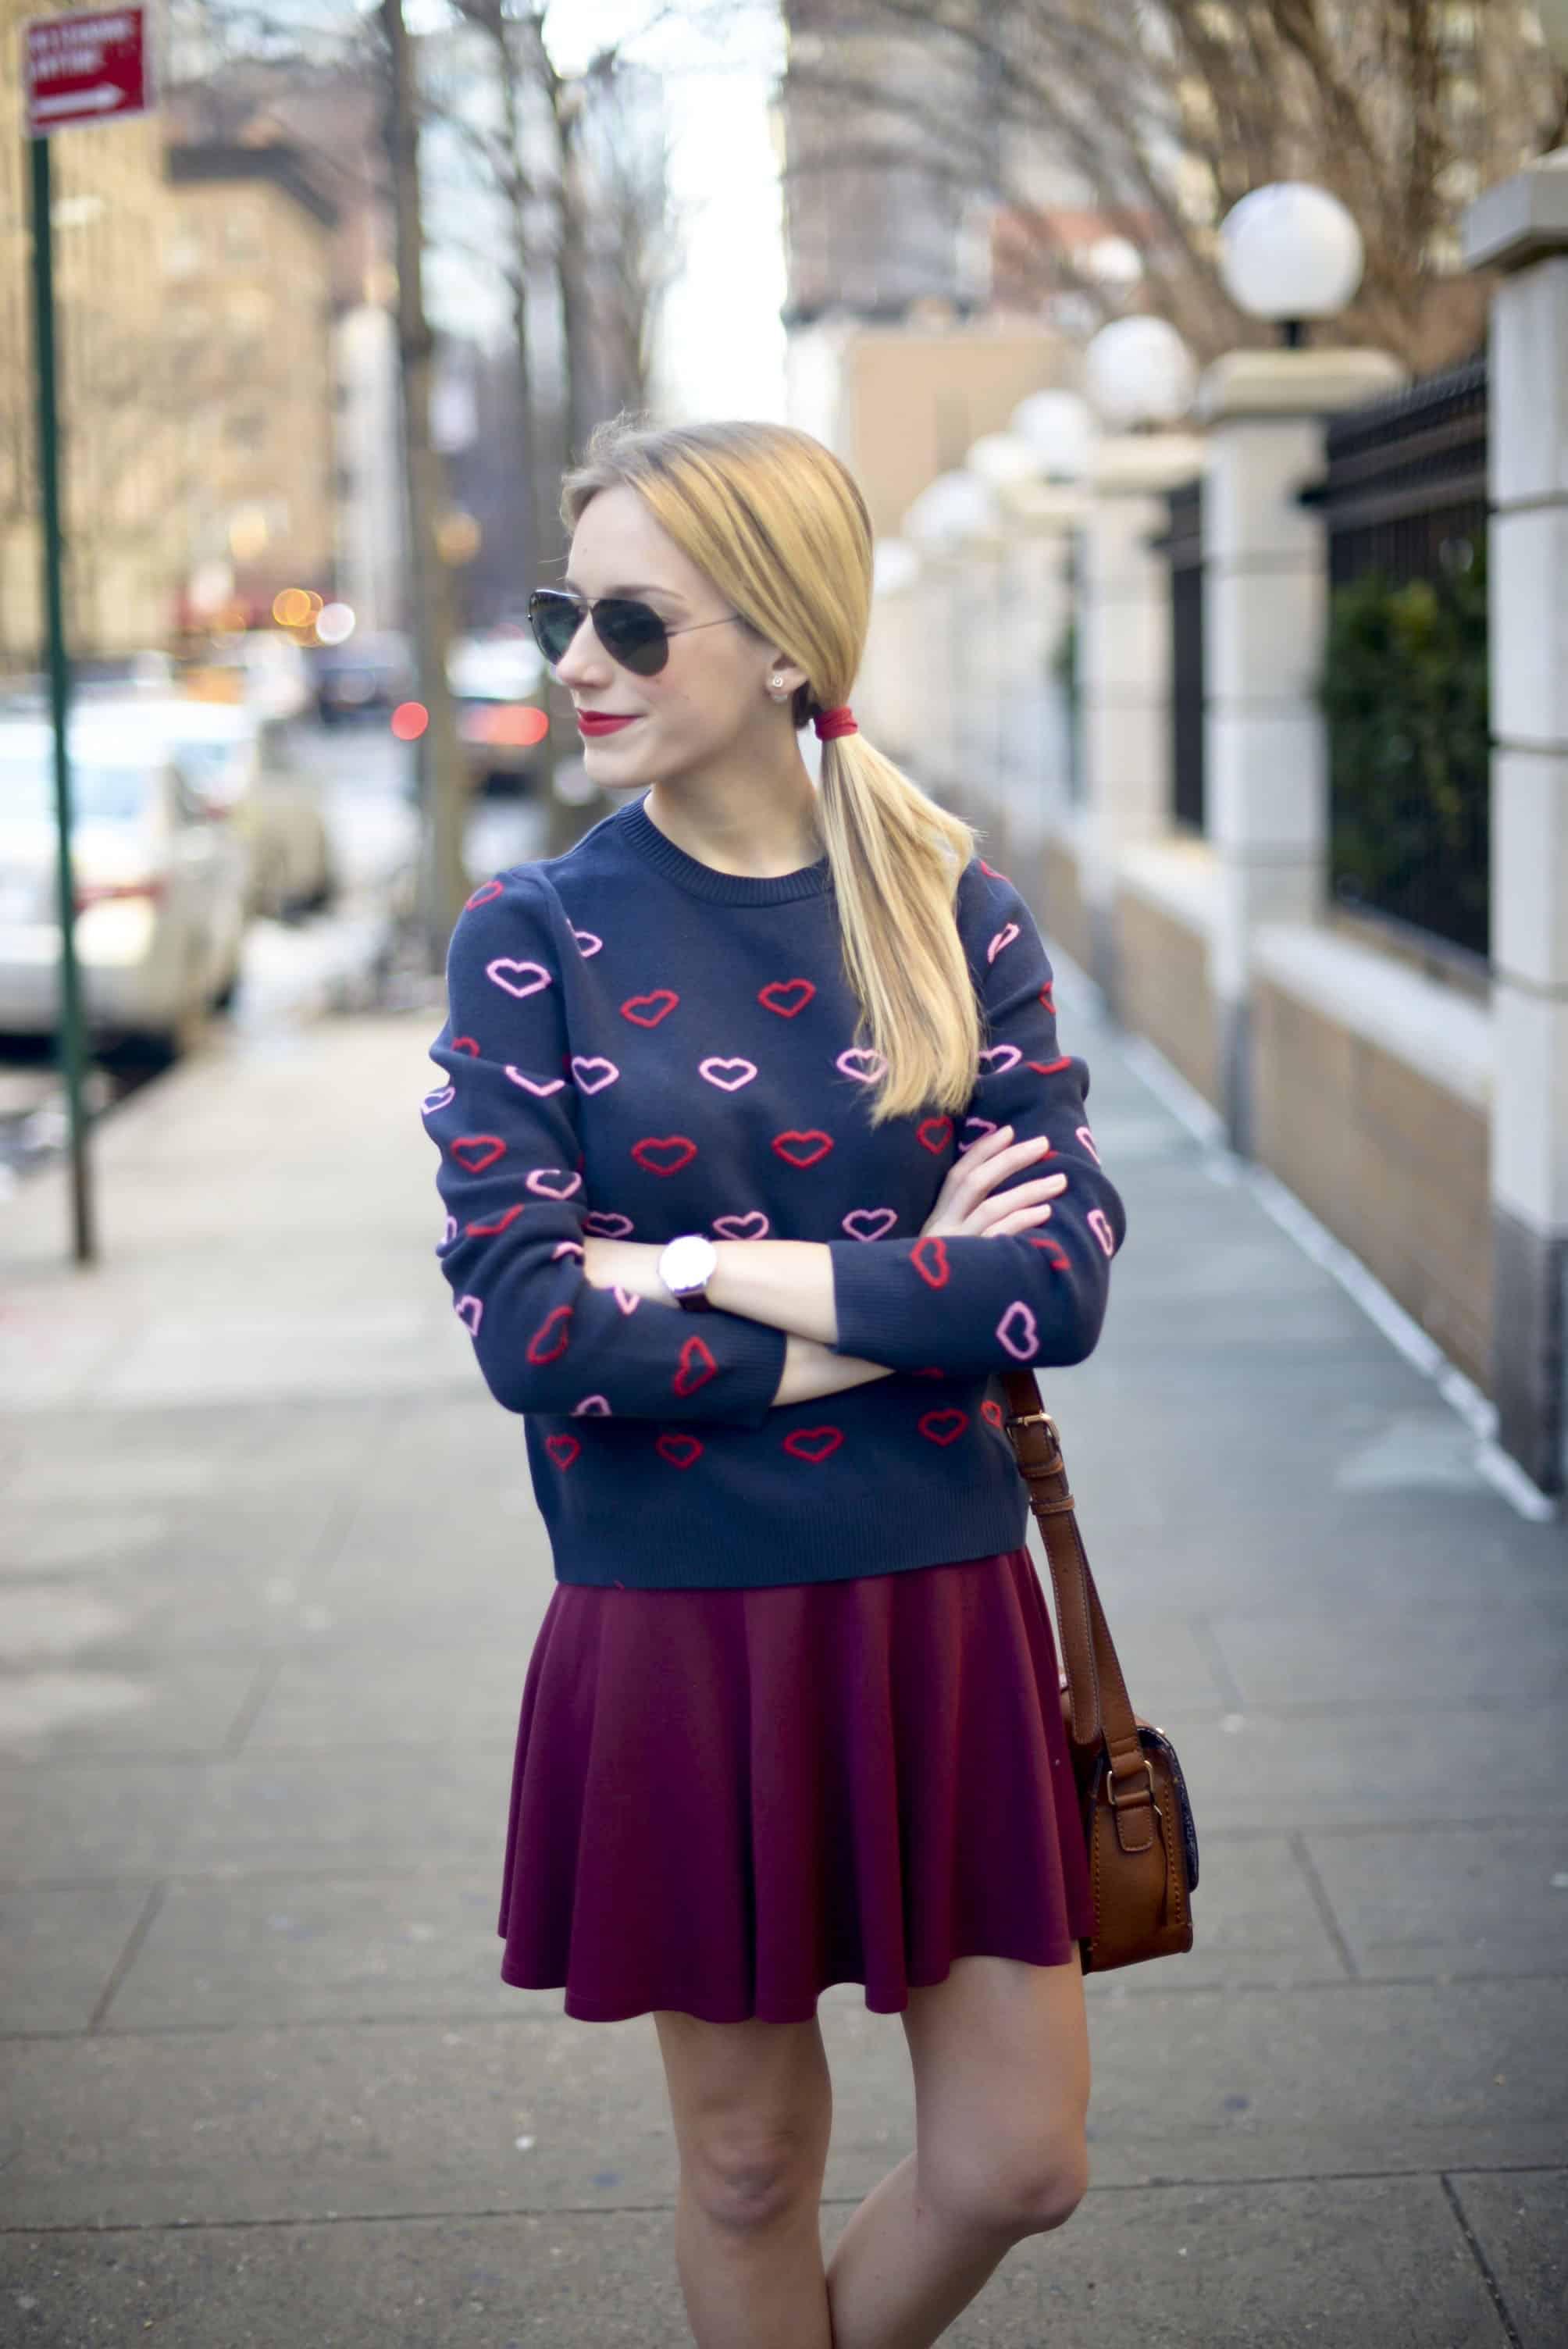 Topshop Heart Sweater